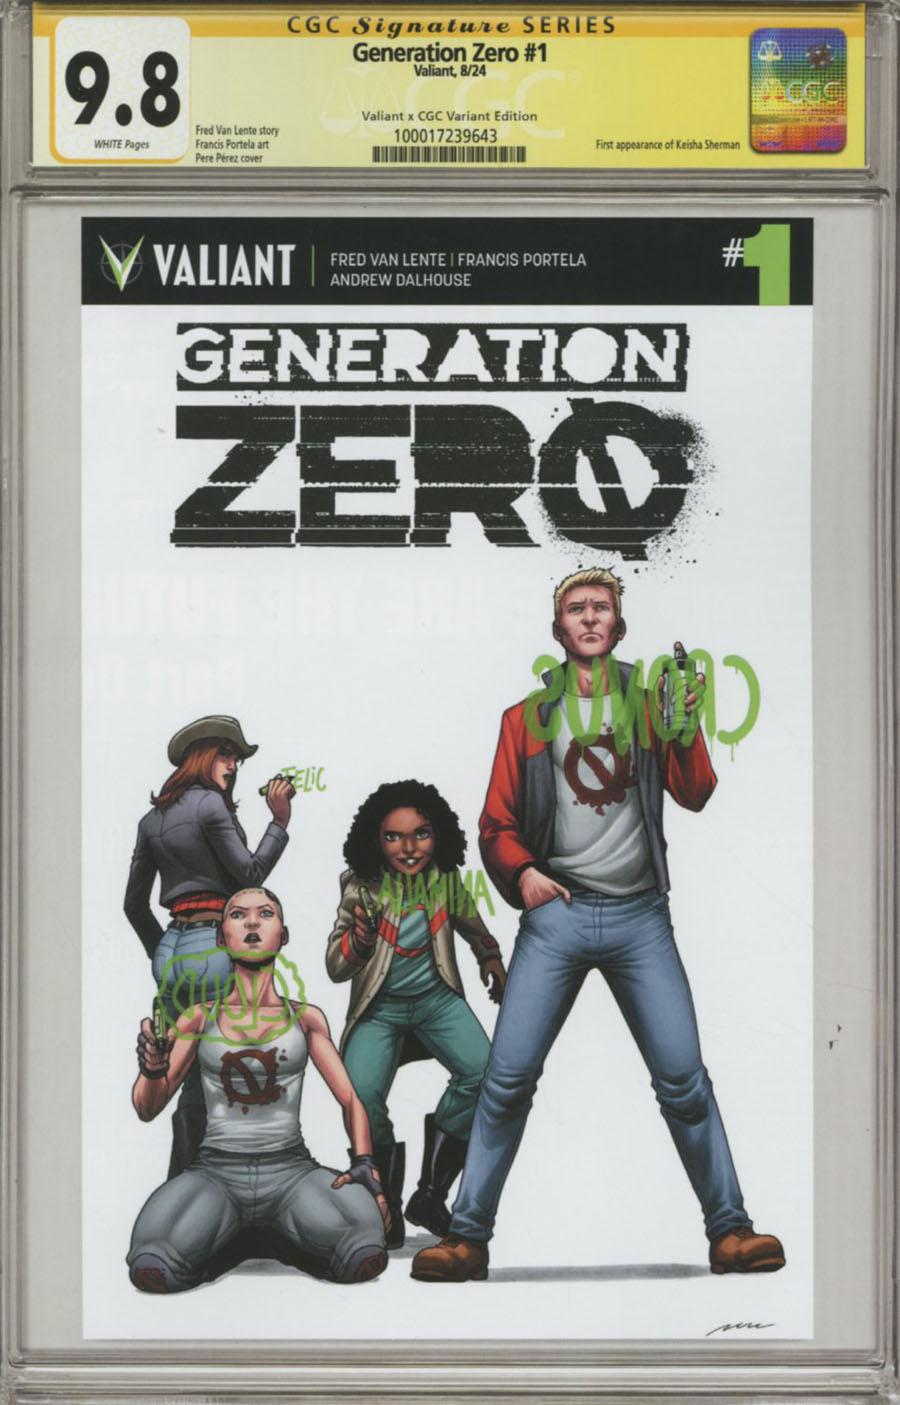 Generation Zero #1 Cover C Variant Pere Perez Valiant x CGC Replica Cover